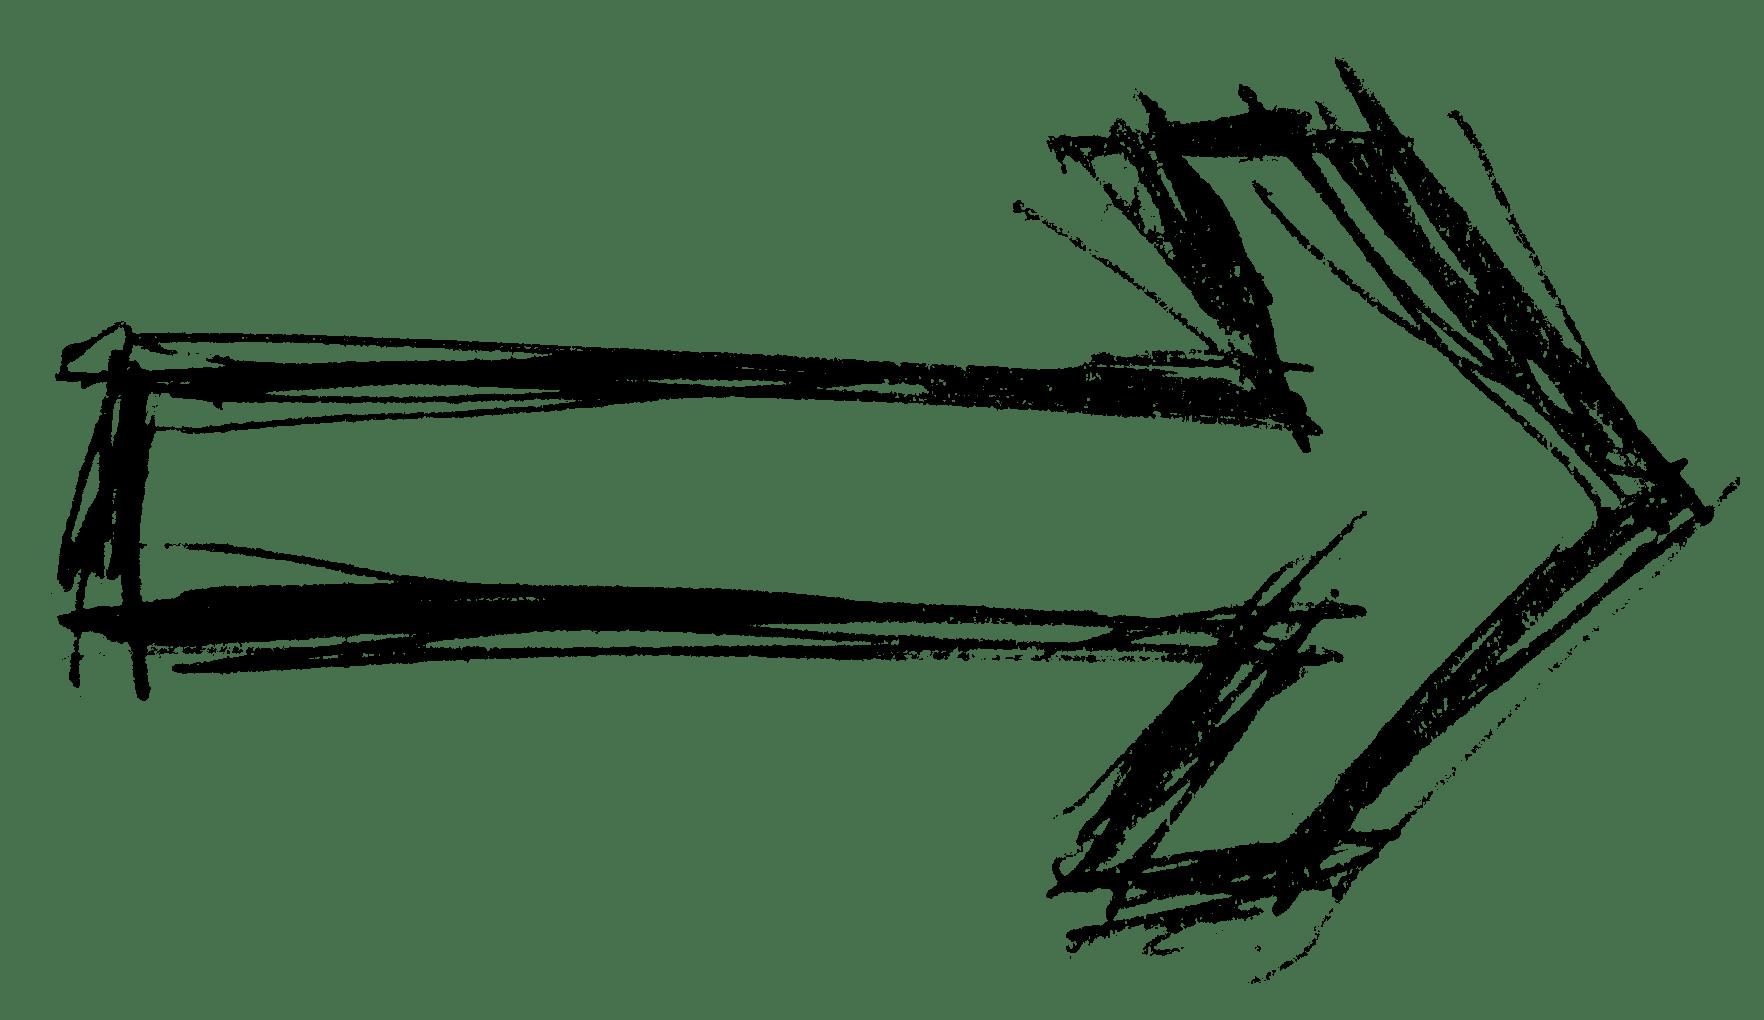 Hand Drawn Arrows Image Transparent